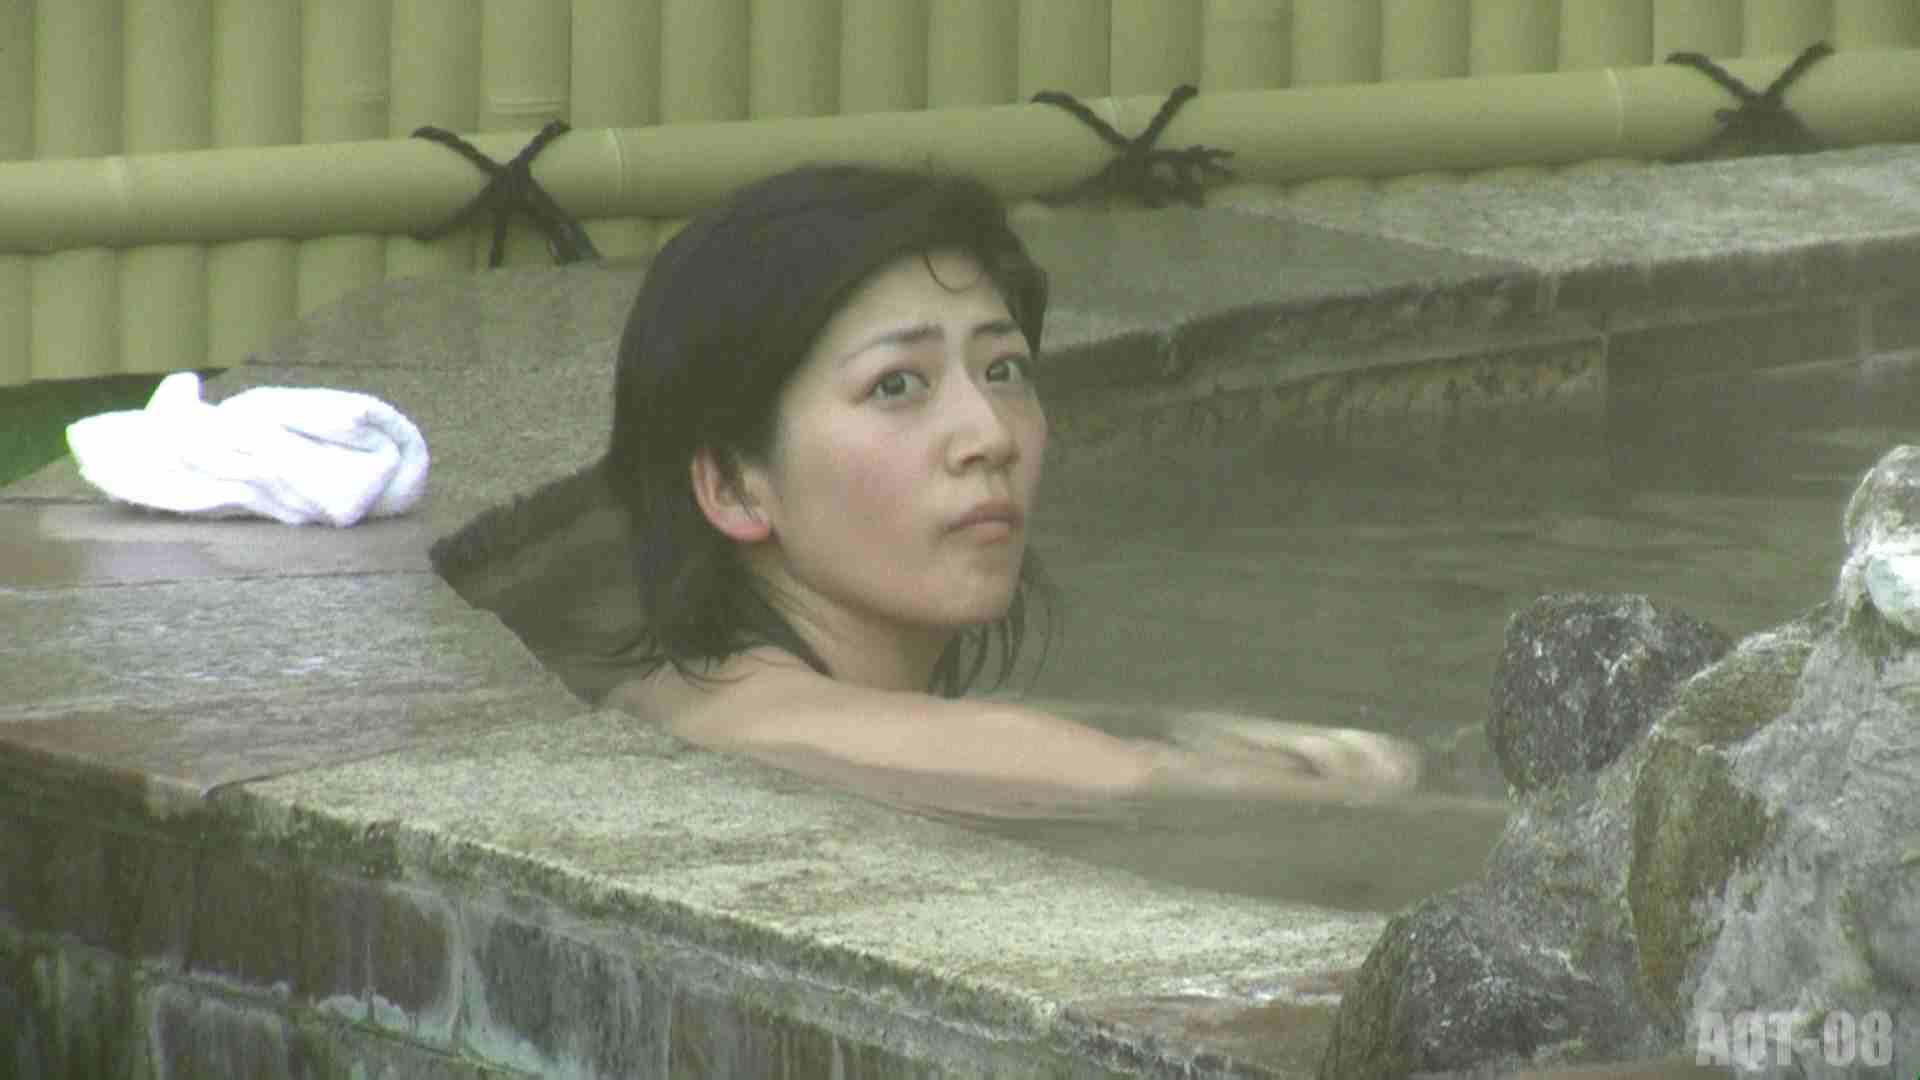 Aquaな露天風呂Vol.776 盗撮 エロ無料画像 108画像 74